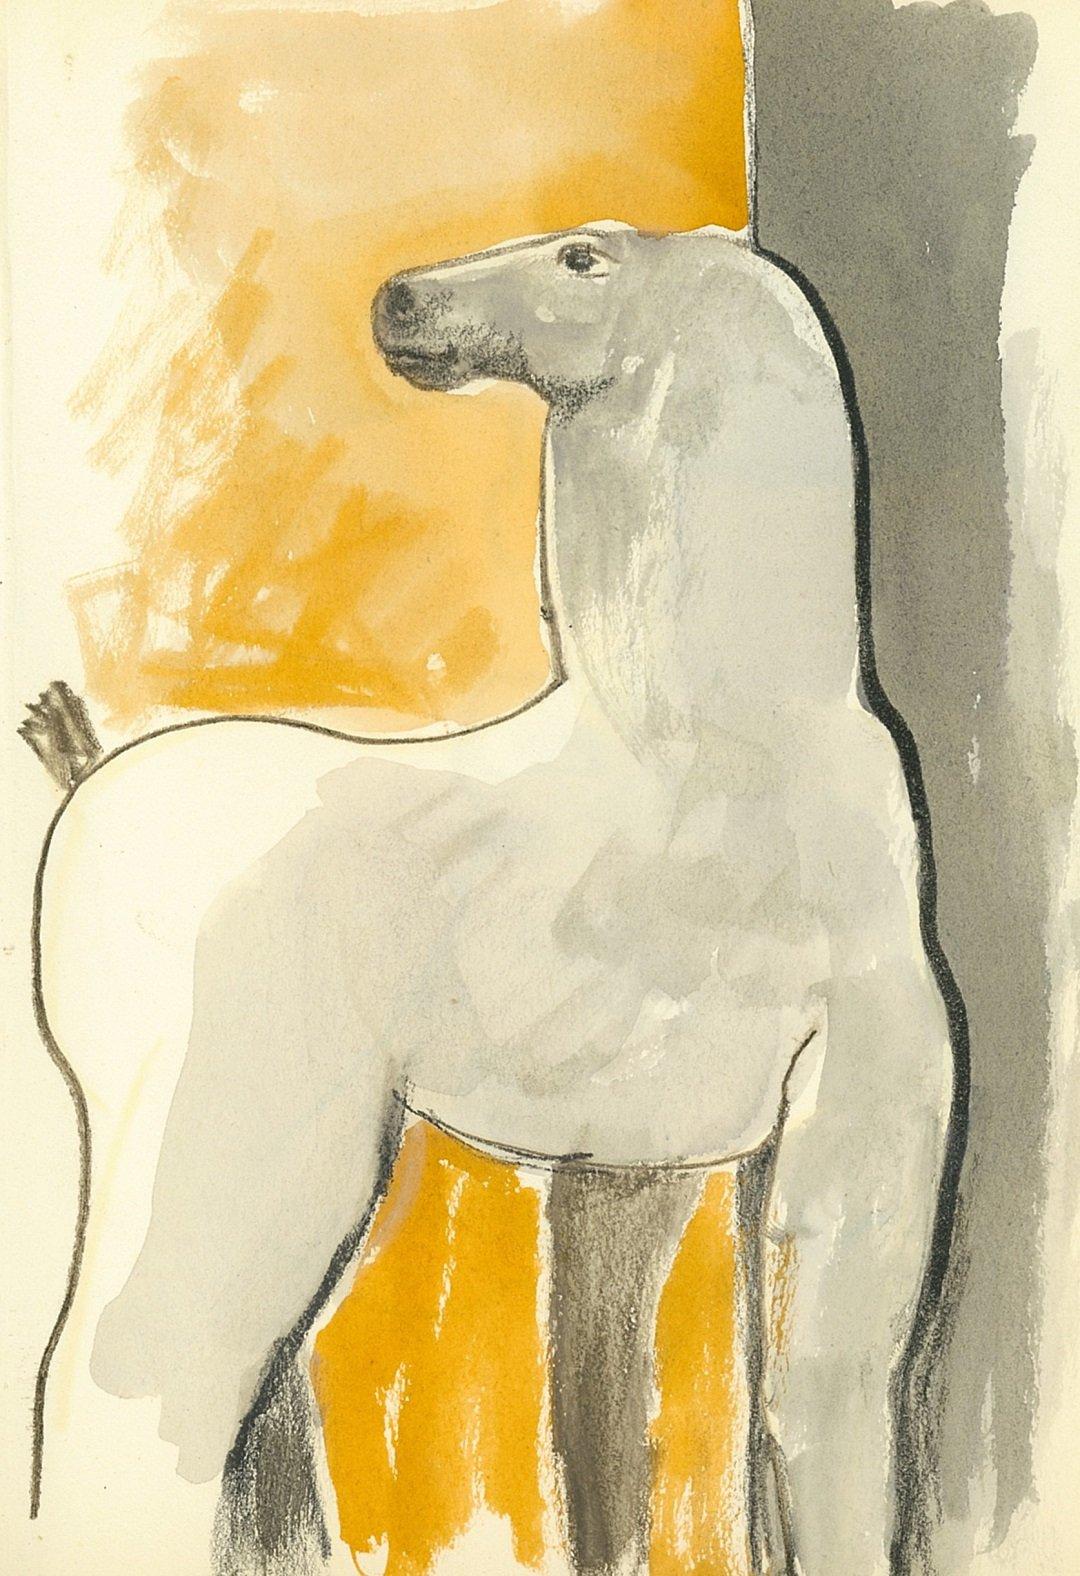 Kobe – Small Horse - drawing - 2002 – (© Kobe)